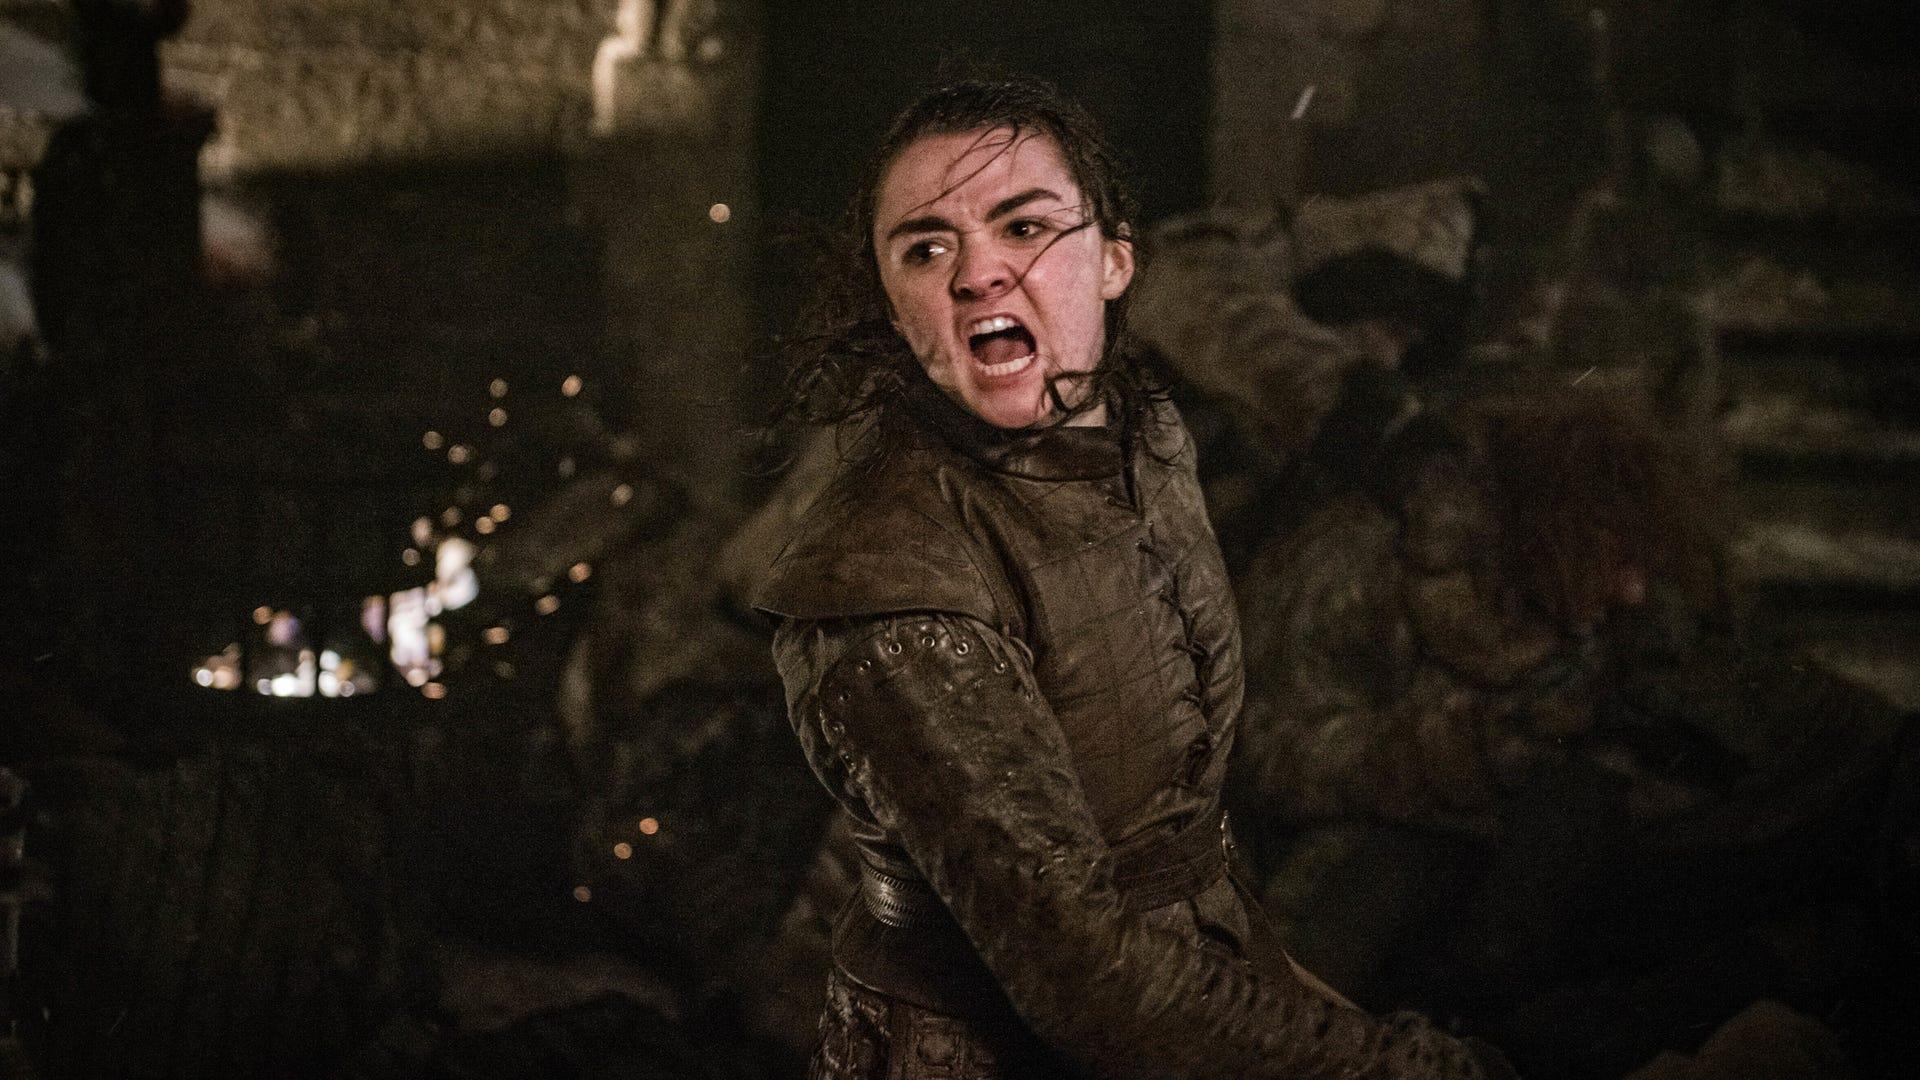 Arya Stark (Maisie Williams), Game of Thrones